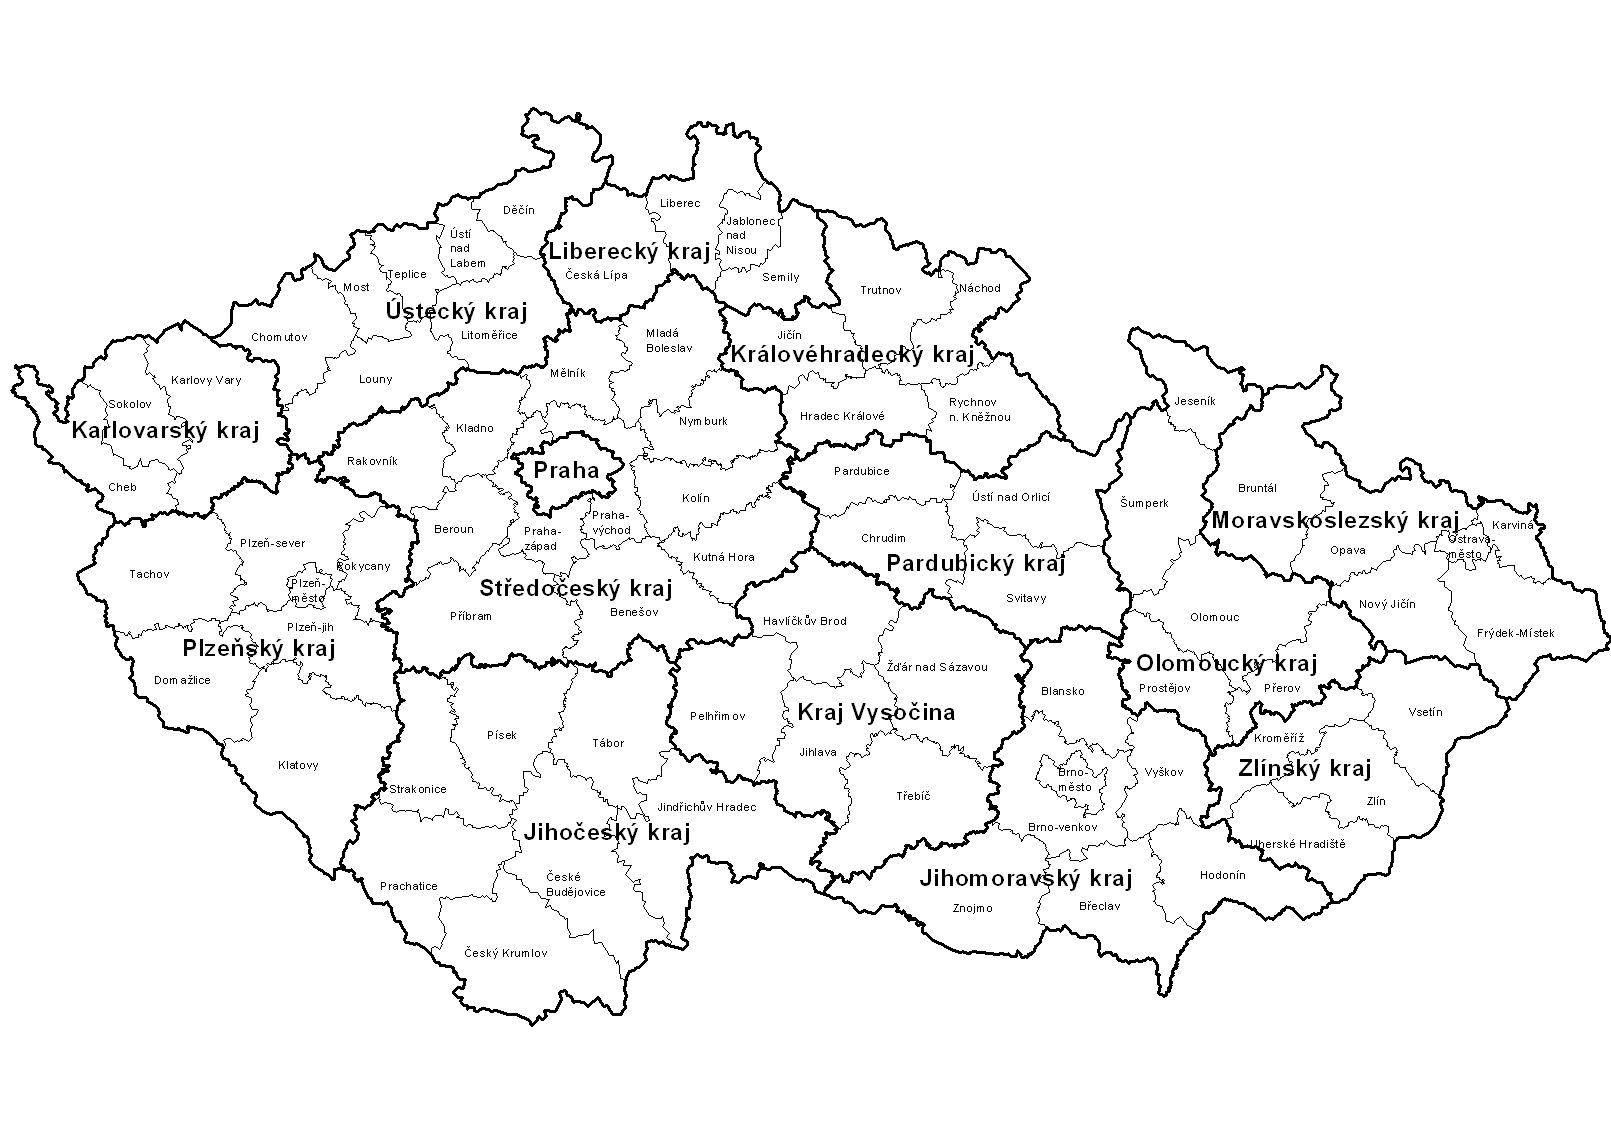 Mapa Kraju Cr Mapa Cr Ceske Republiky Uceni Zemepis